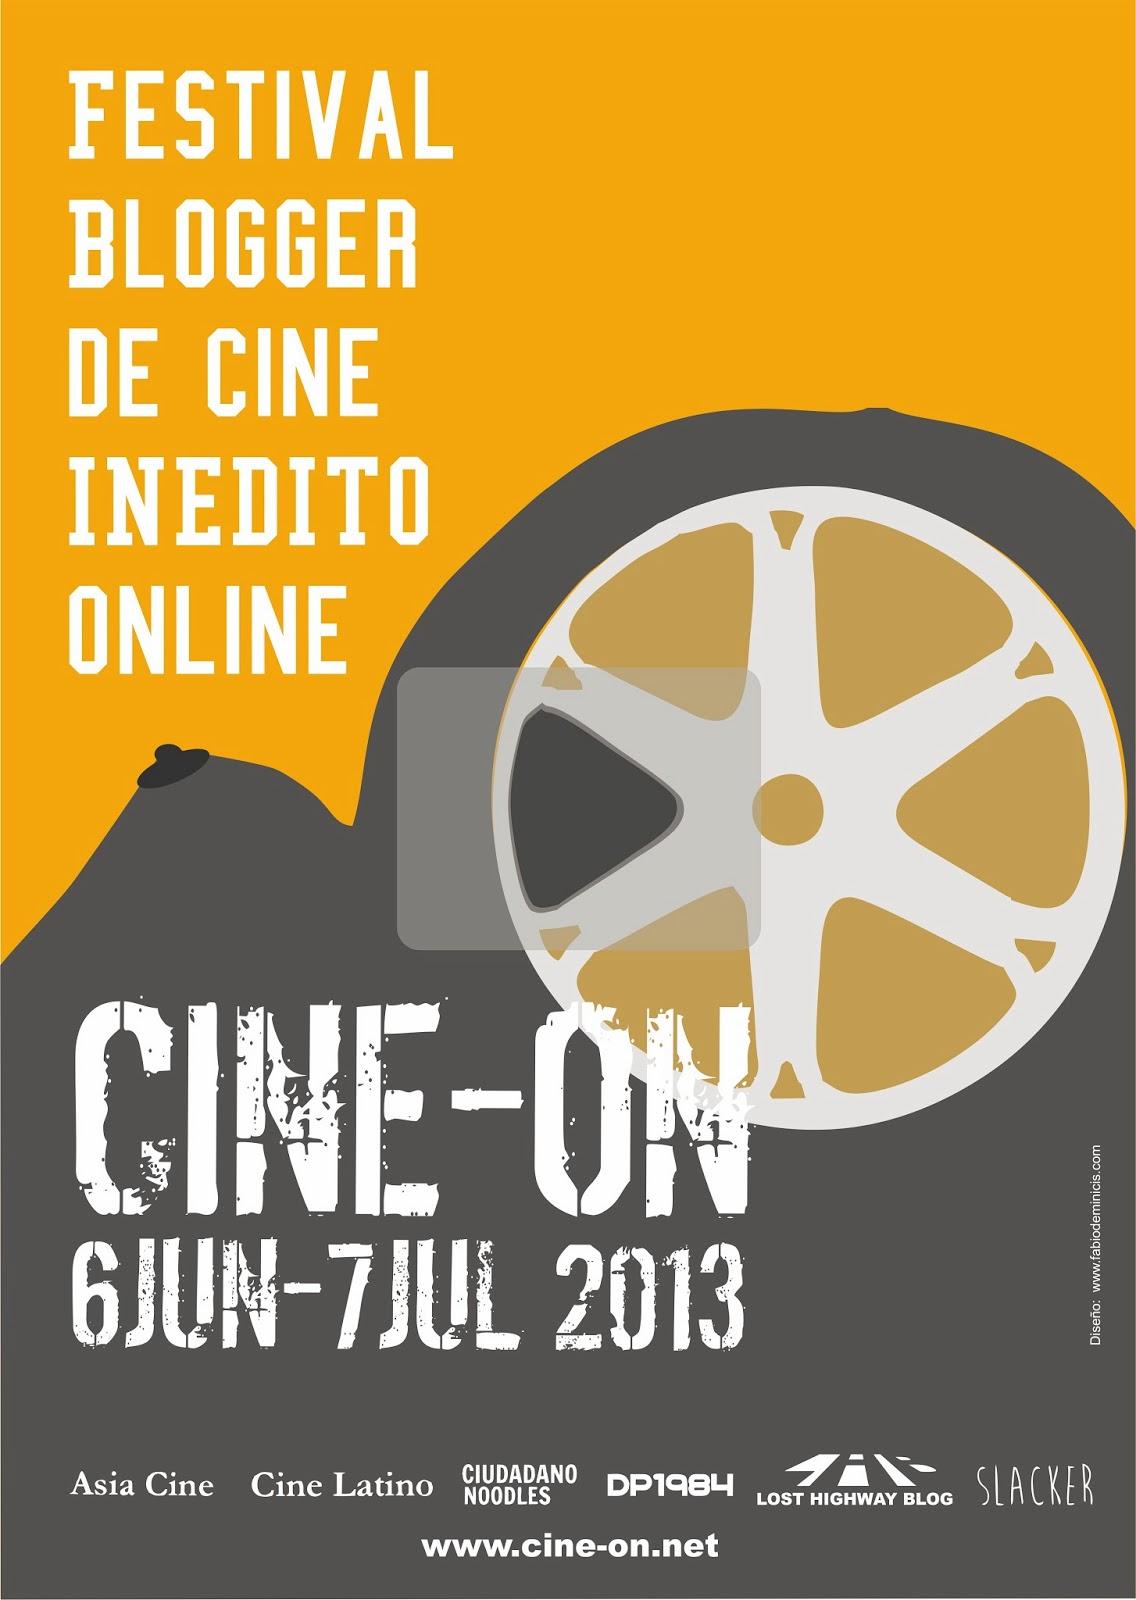 Festival Blogger de Cine Inédito